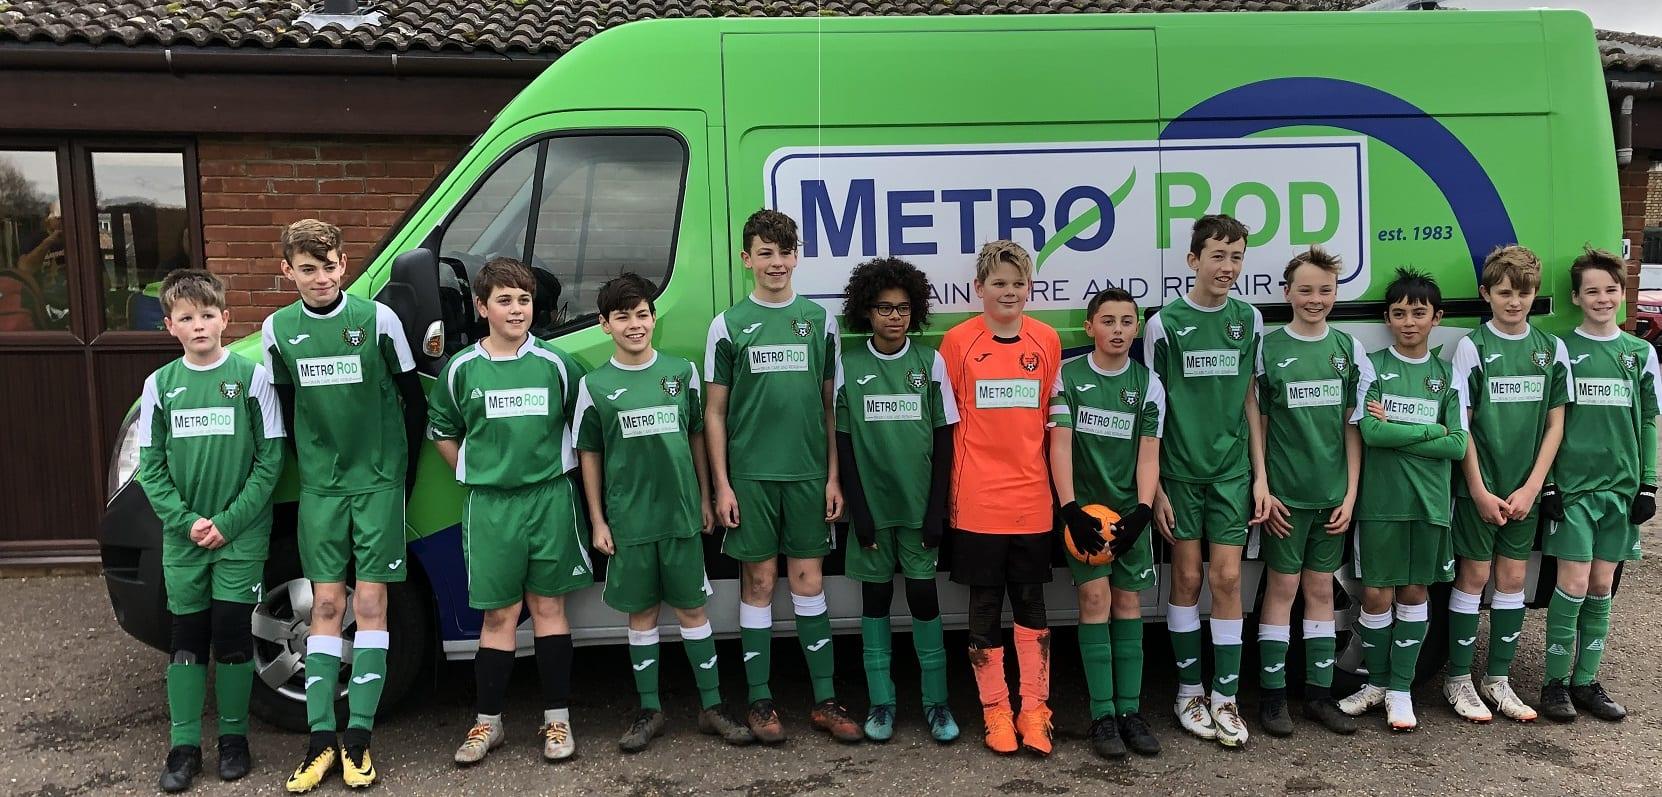 Metro Rod Norwich Are Proud Sponsors Of Tasburgh United